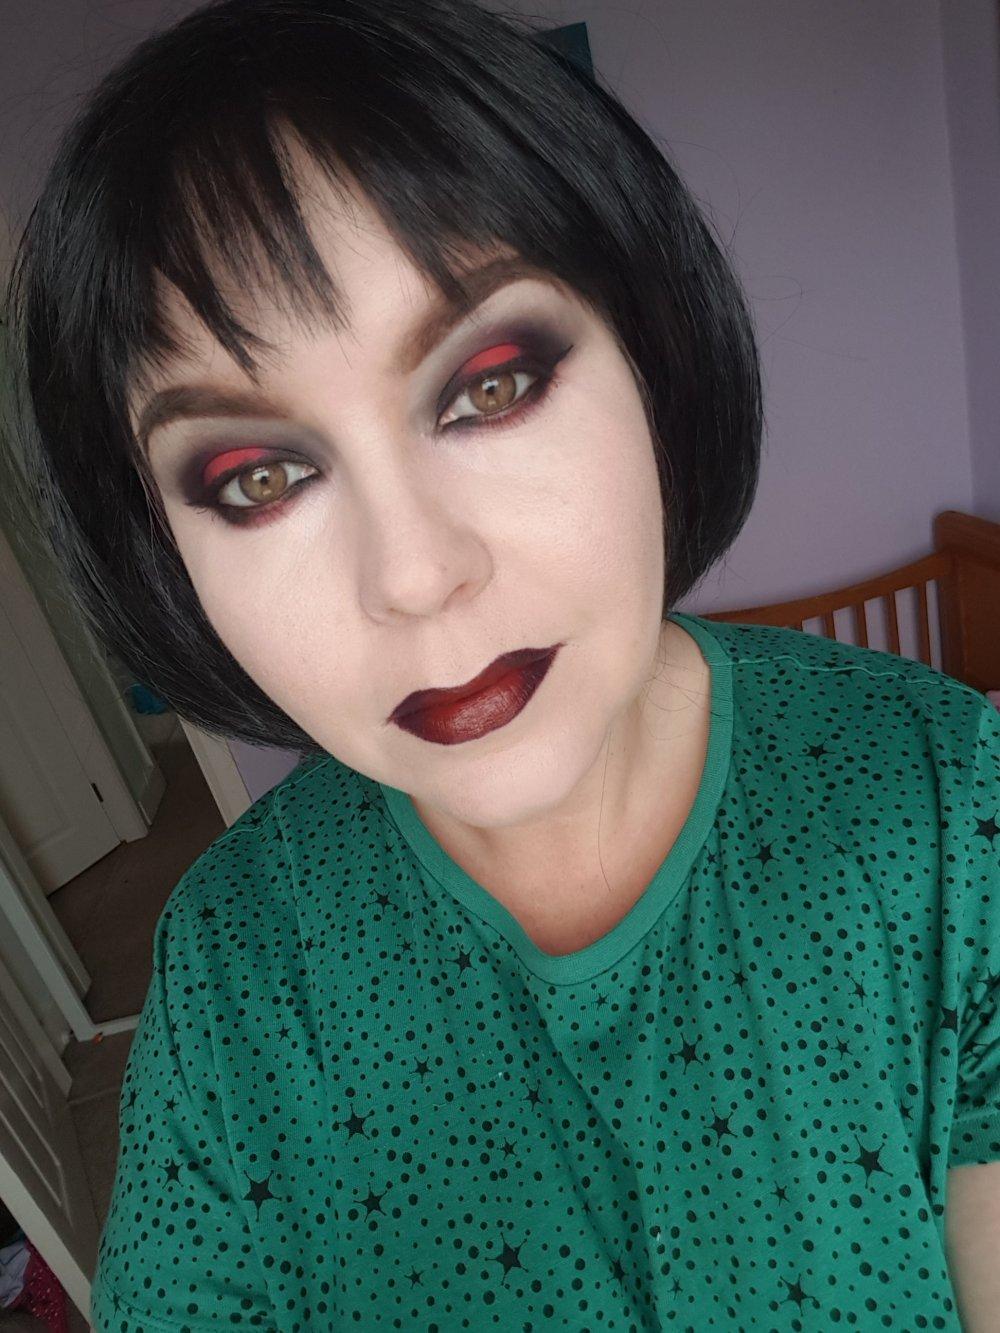 Alternative Halloween makeup red and black Halo eye